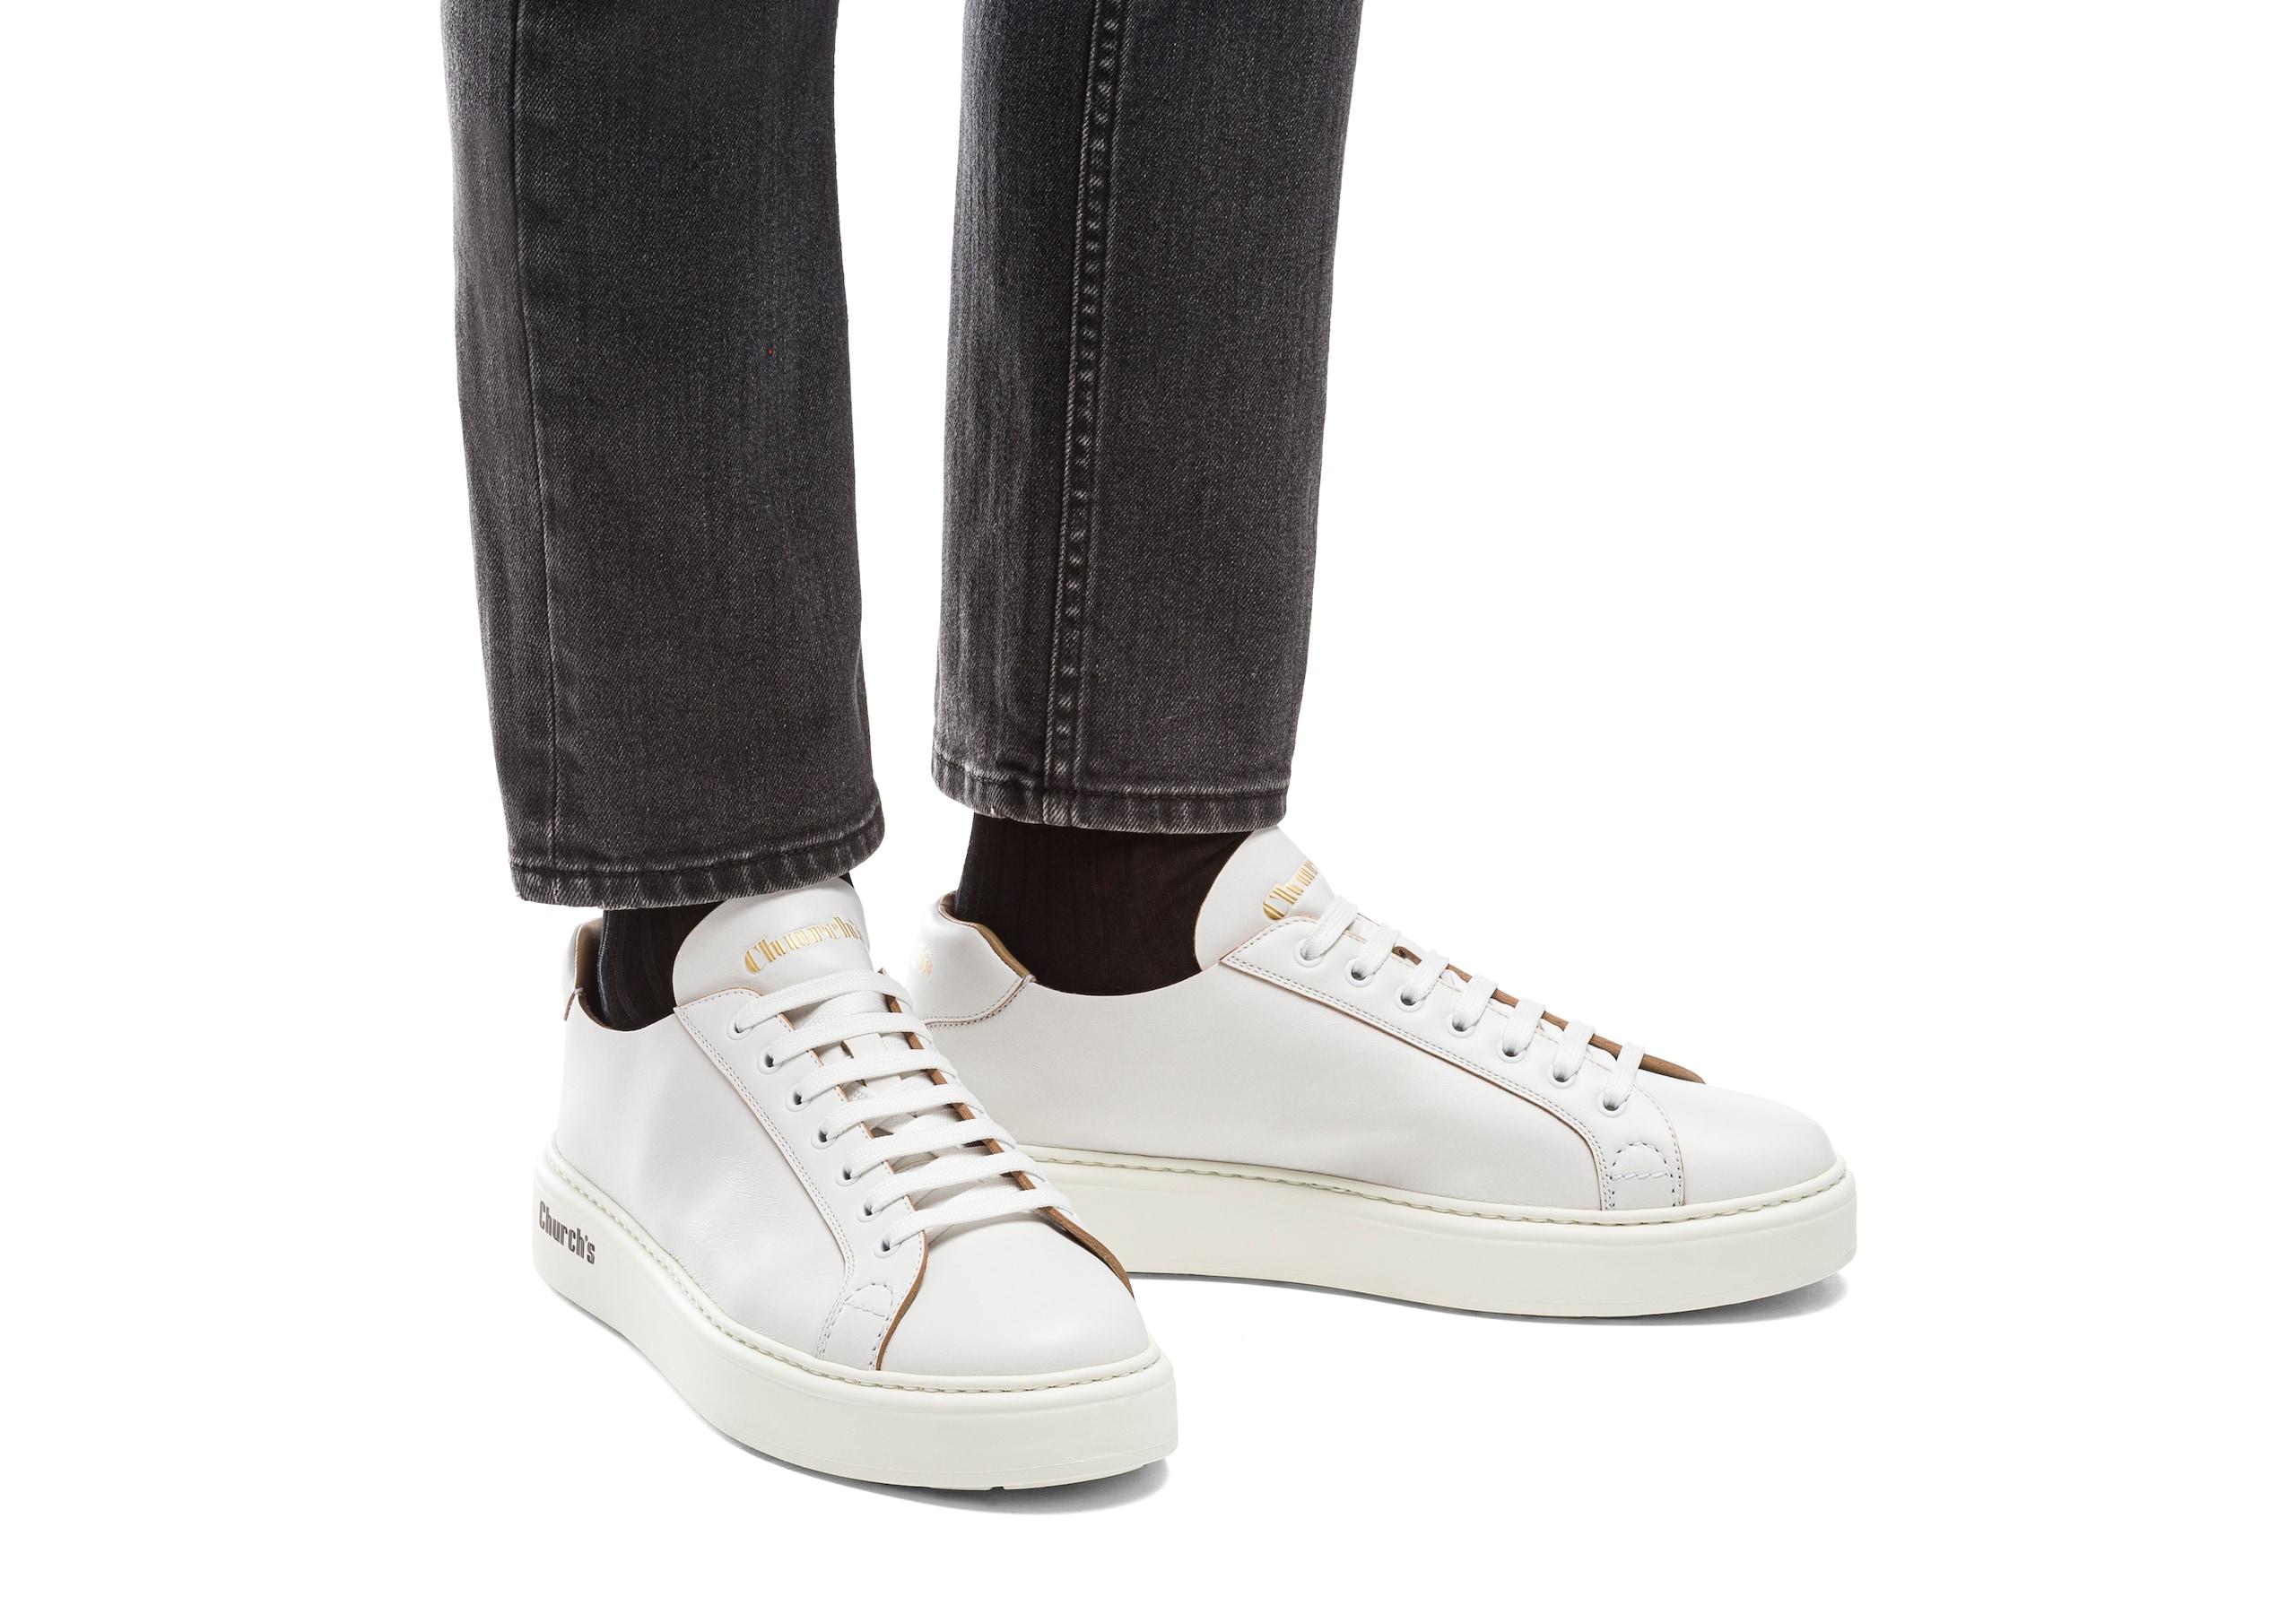 Mach 1 Church's Monteria Calf Classic Sneaker White